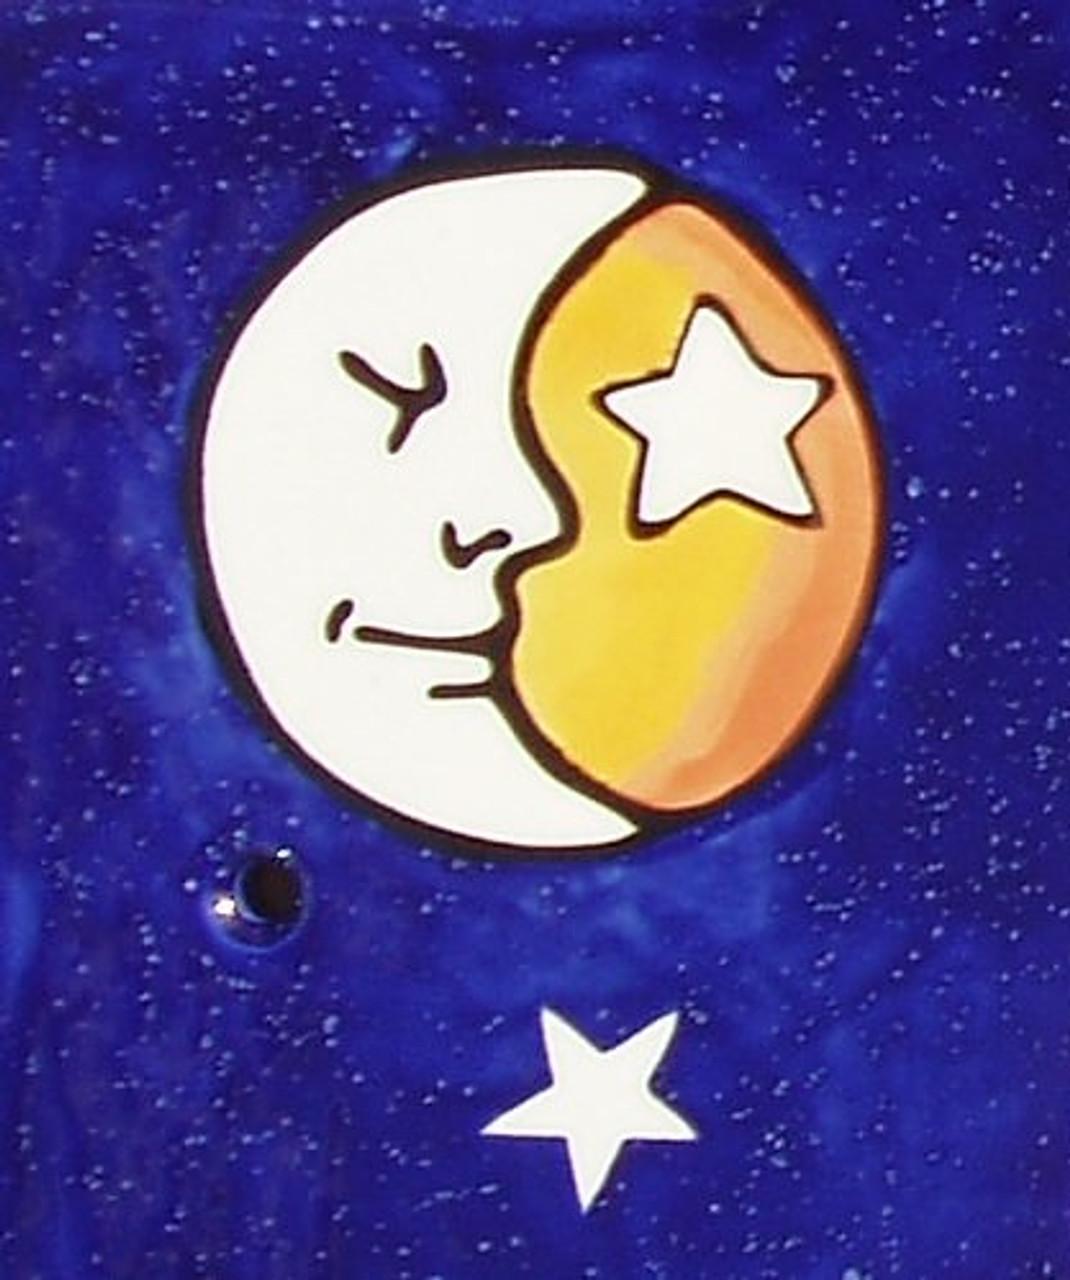 Half Face Moon detail